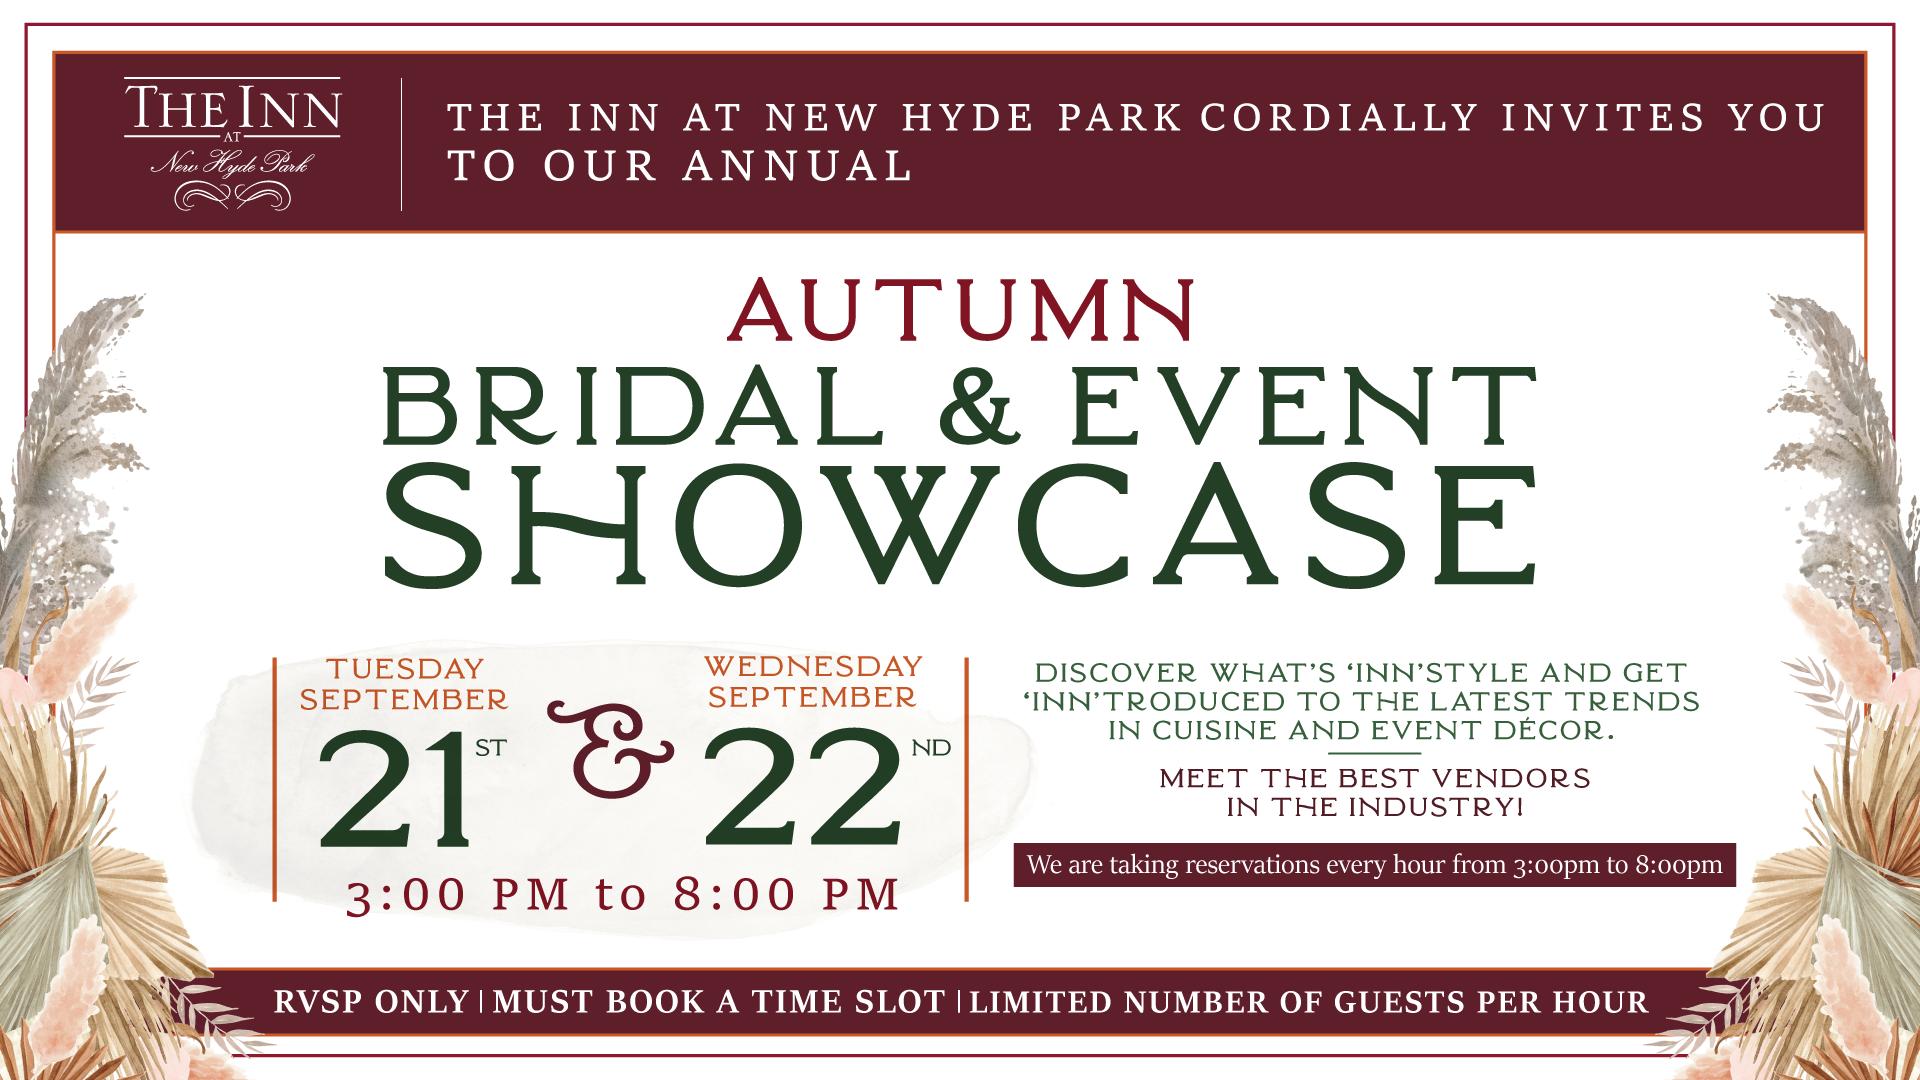 Autumn Bridal & Event Showcase